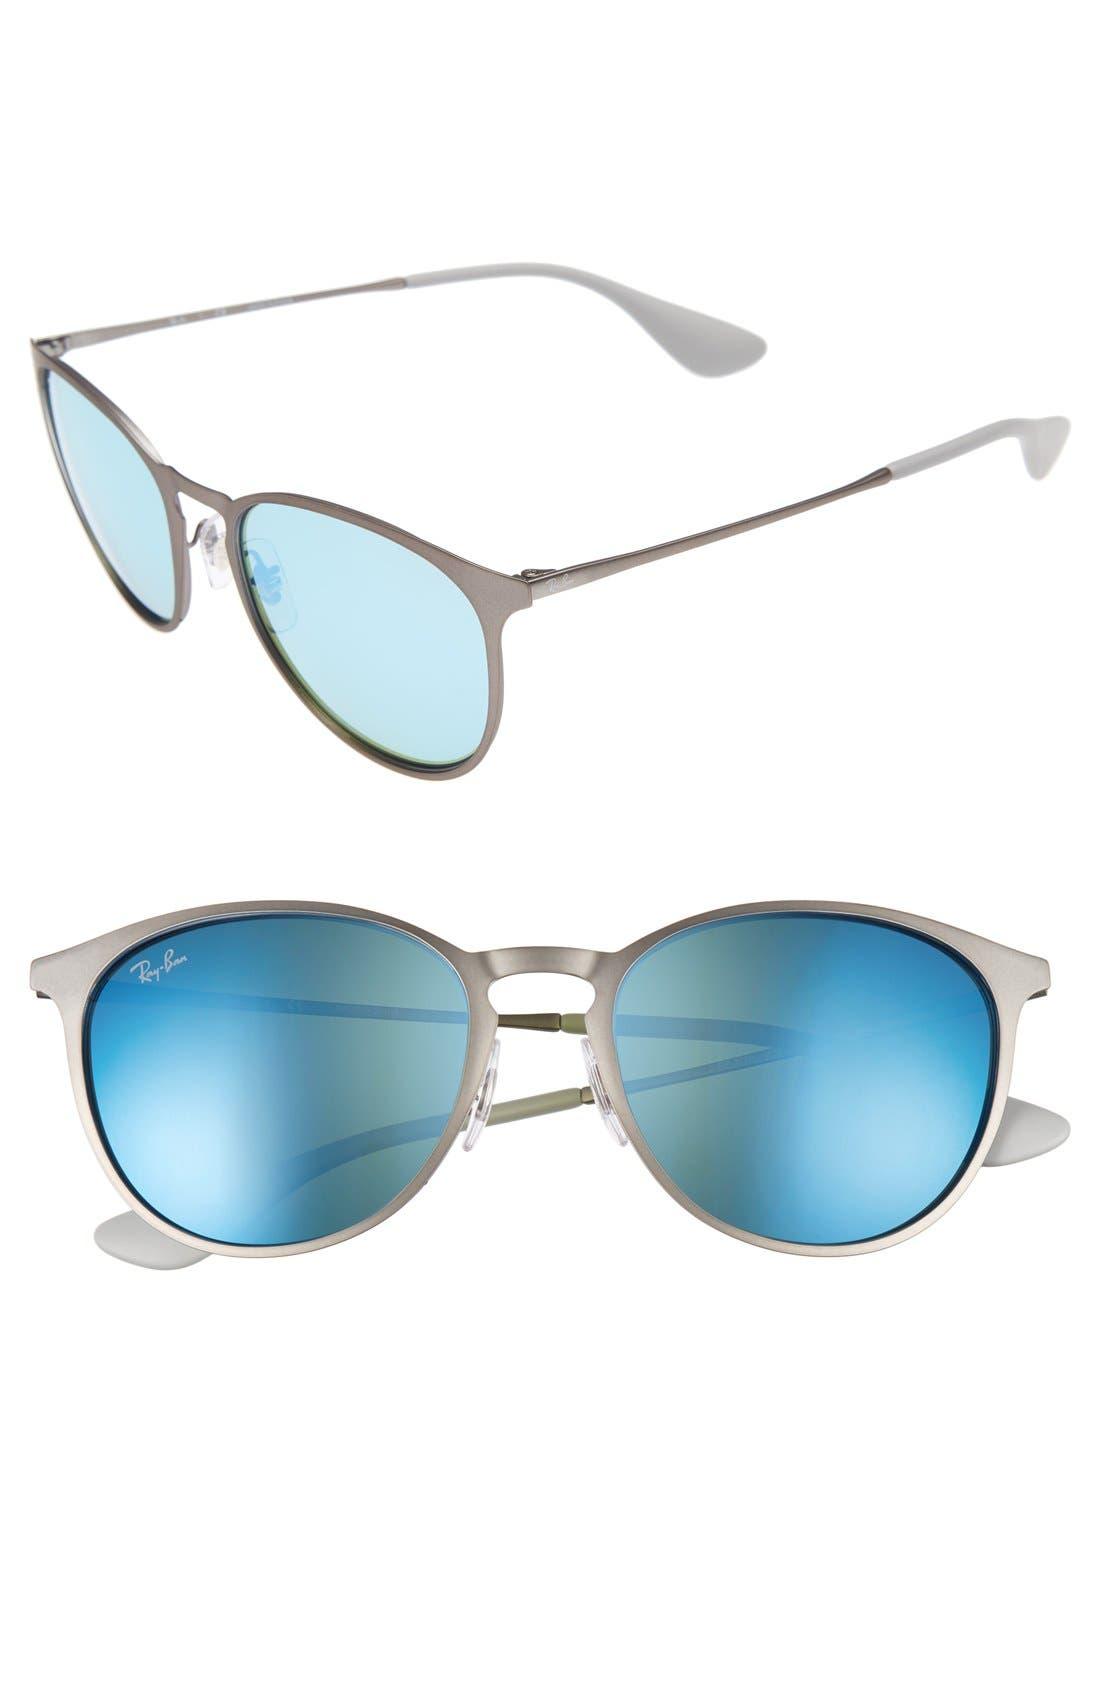 Highstreet 54mm Sunglasses,                         Main,                         color, 300